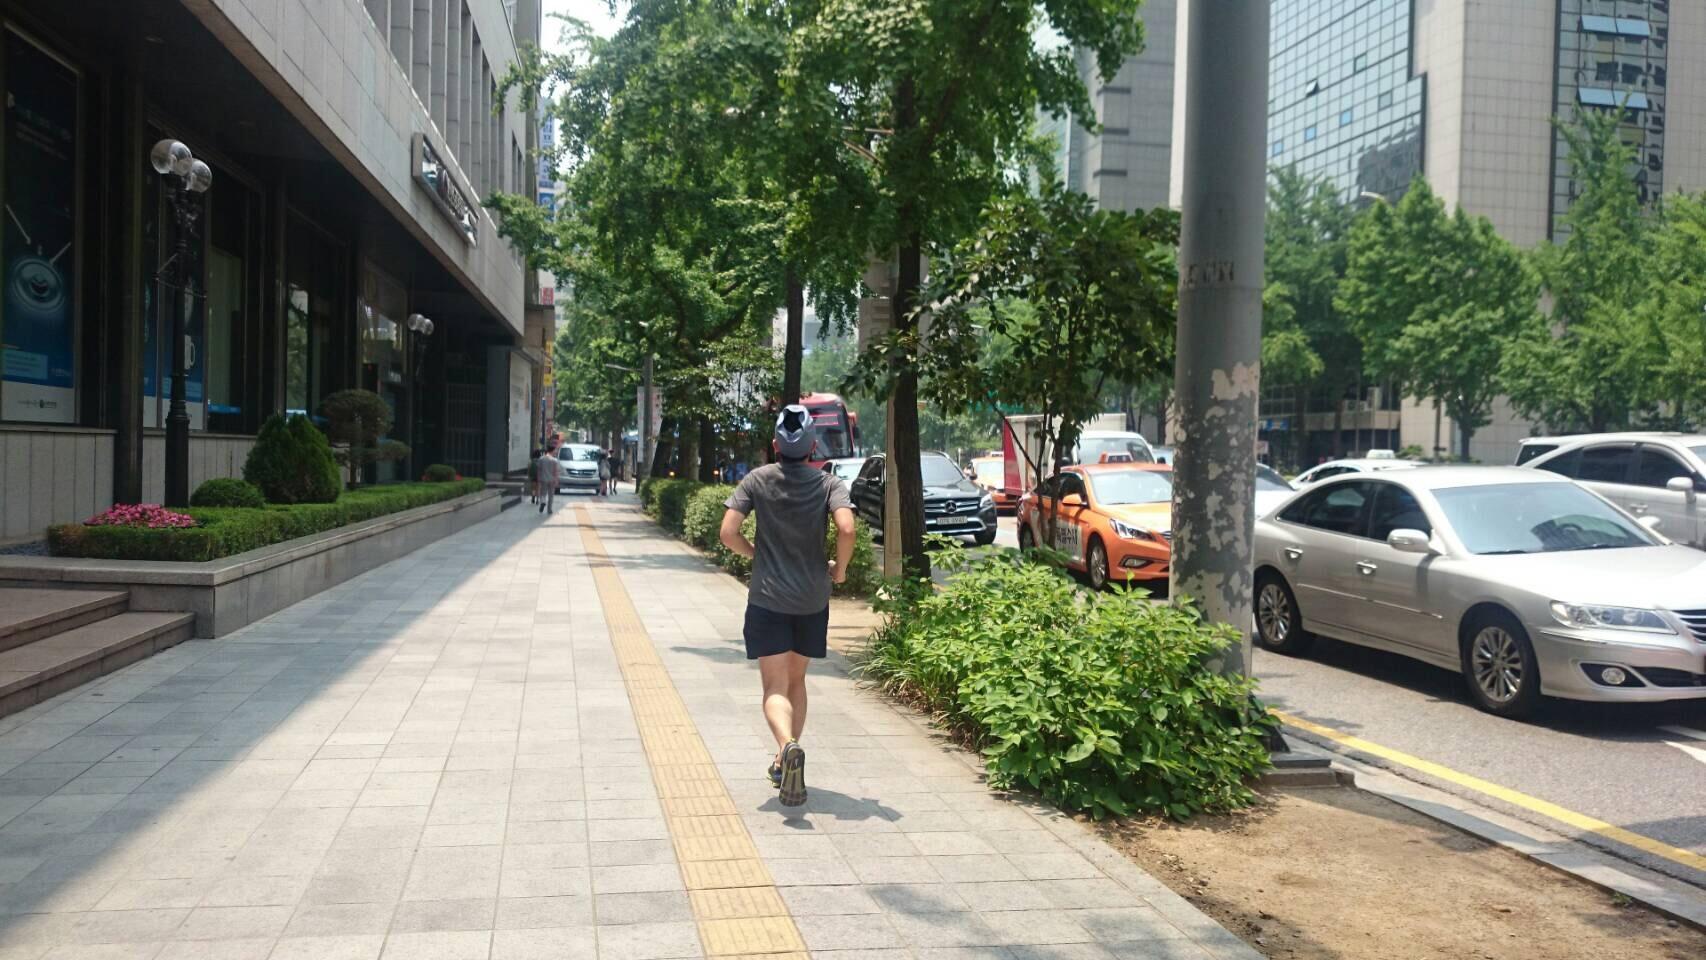 2016.6.16-19 SEOUL TRIP ~食べて呑んで走るソウルの旅~ day3-4_b0219778_22382868.jpg